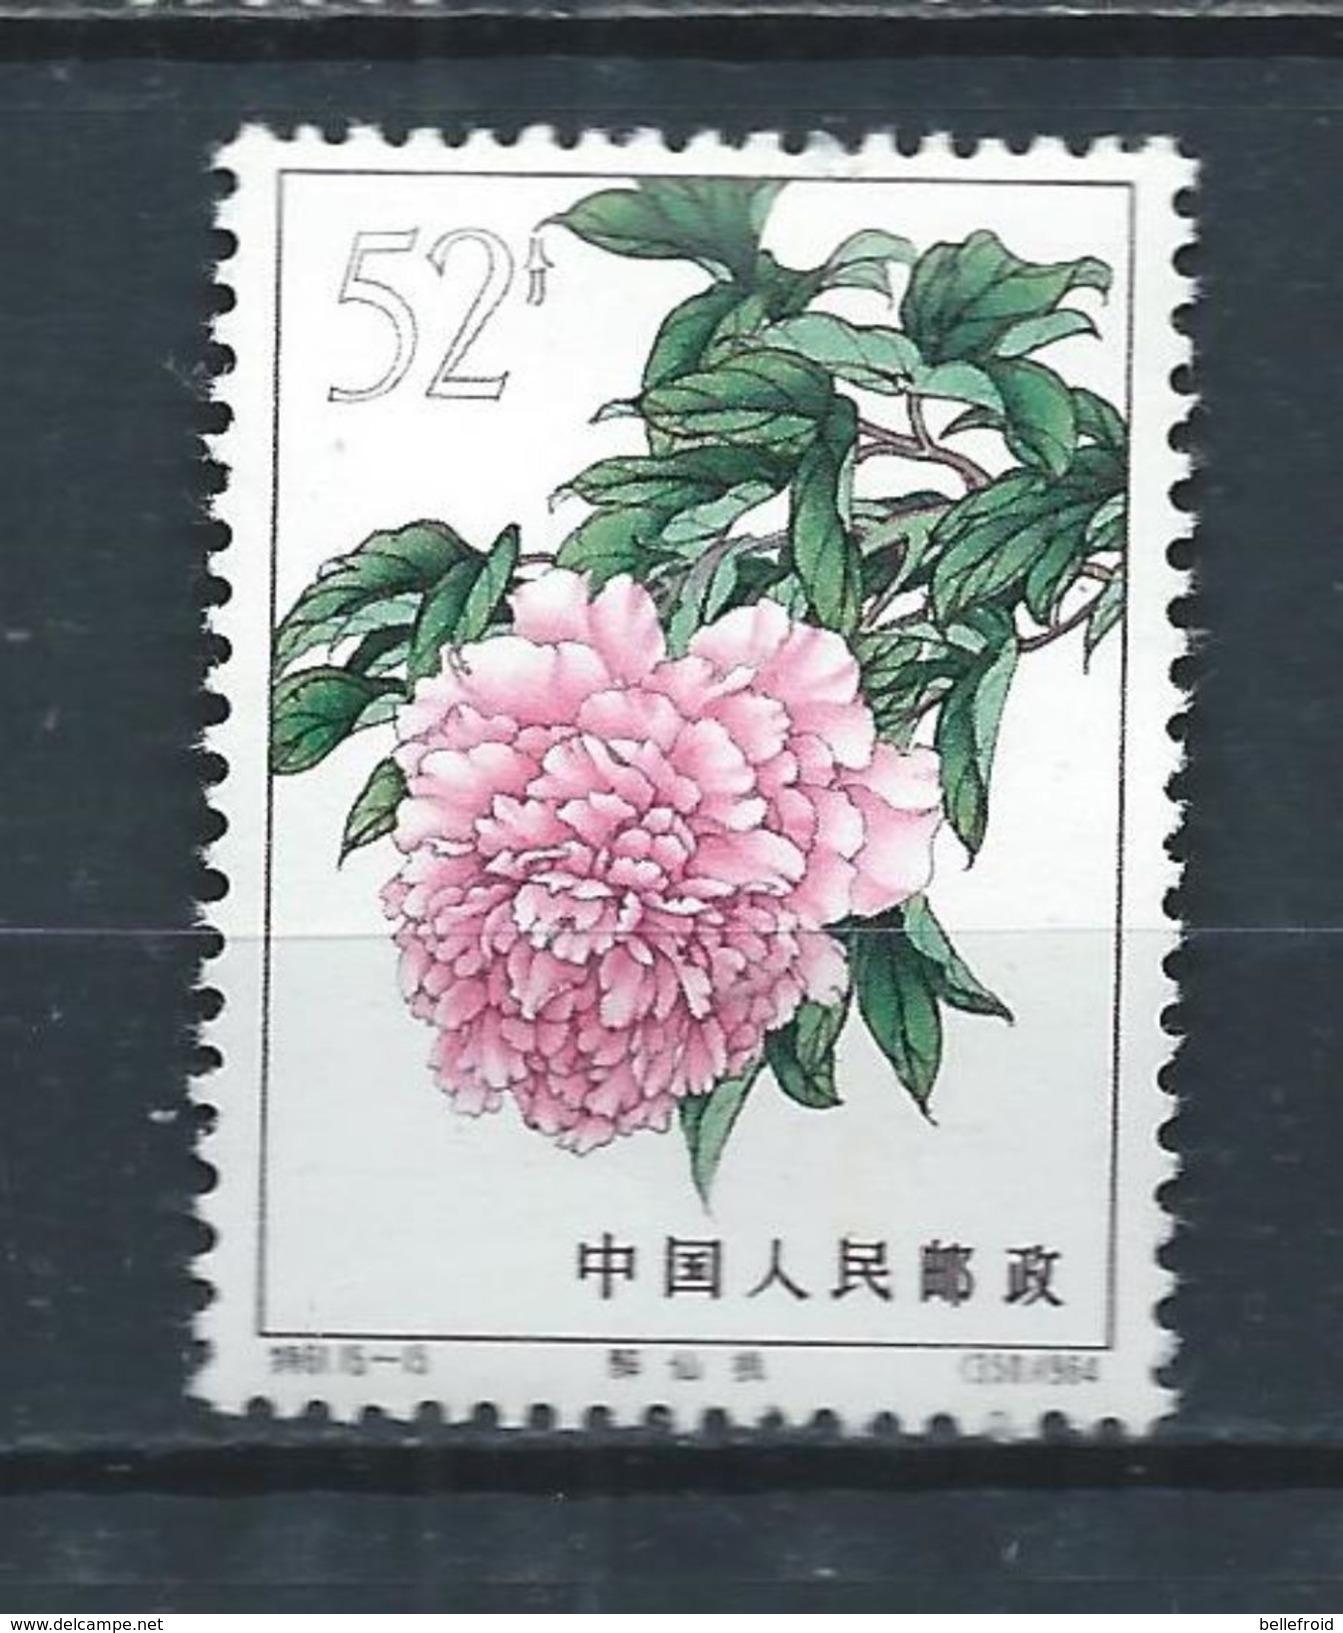 1964 CHINA PEONIES 52 Fen (15-15) O.G. MNH SCV $190 - Nuovi